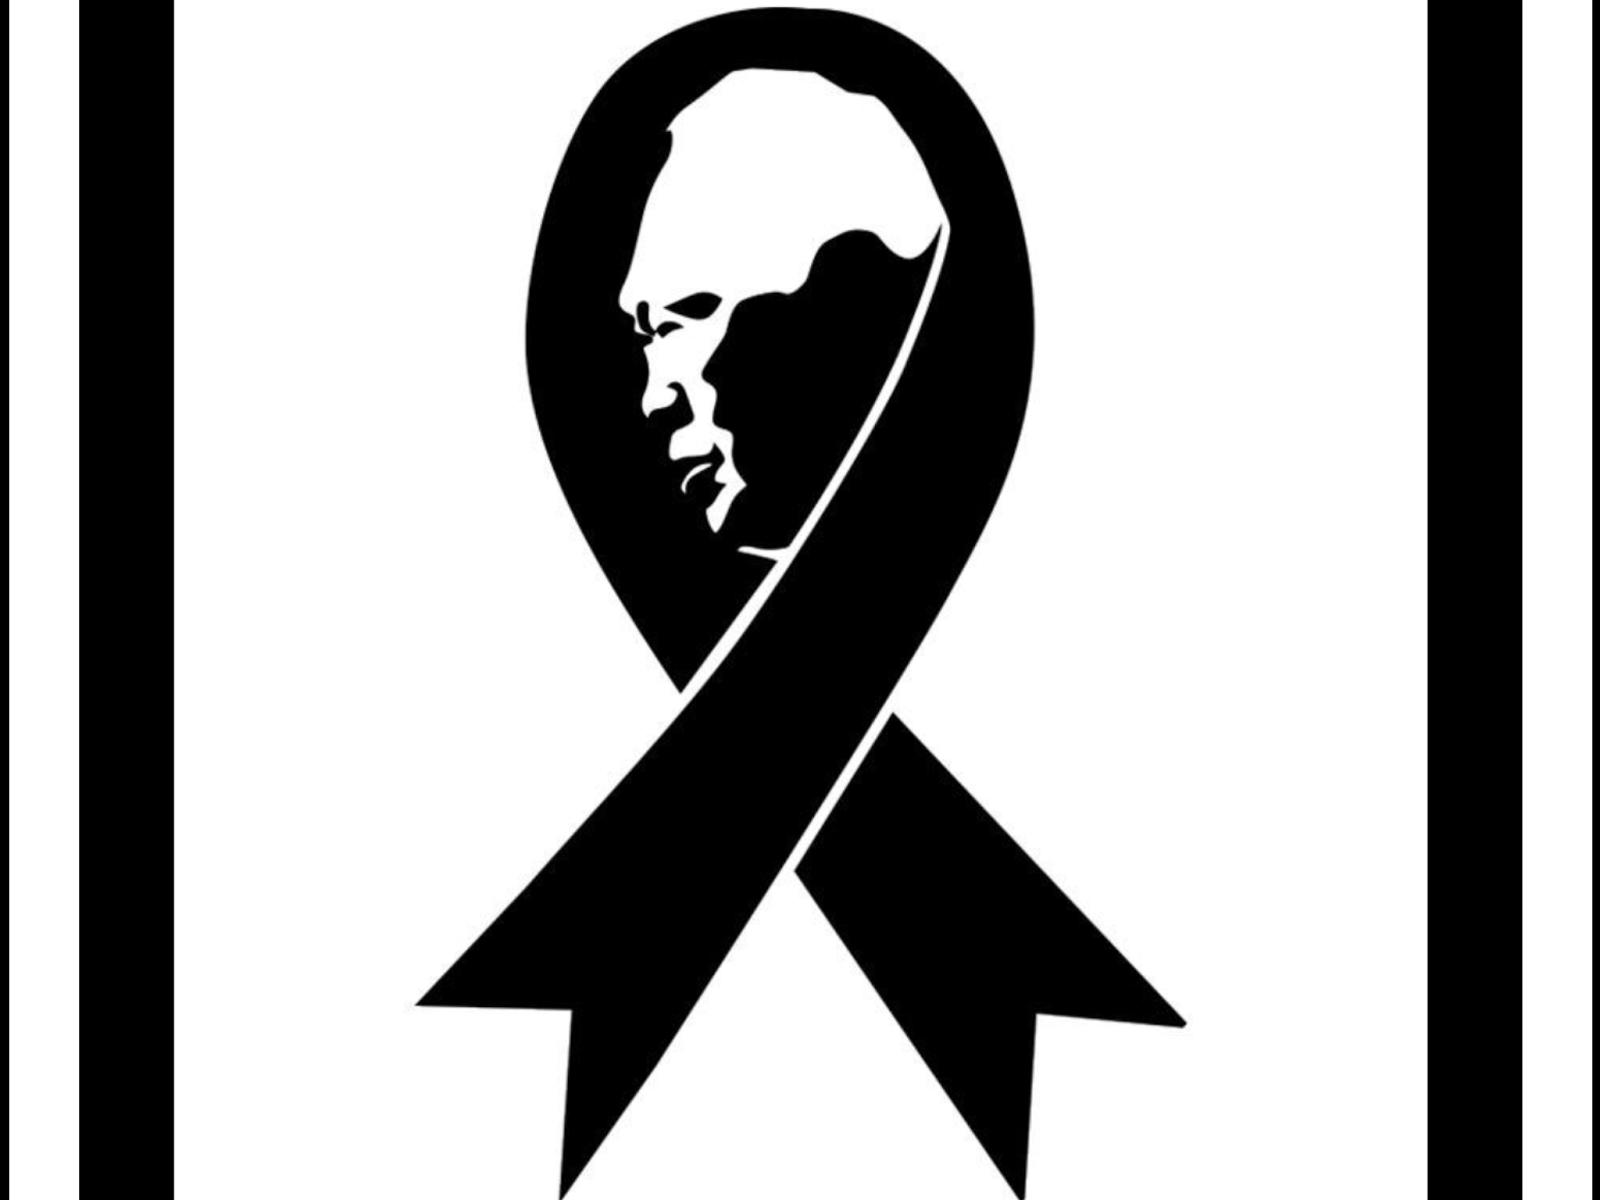 My Tribute : Remembering Lee Kuan Yew 16 Sep 1923 - 23 Mar 2015